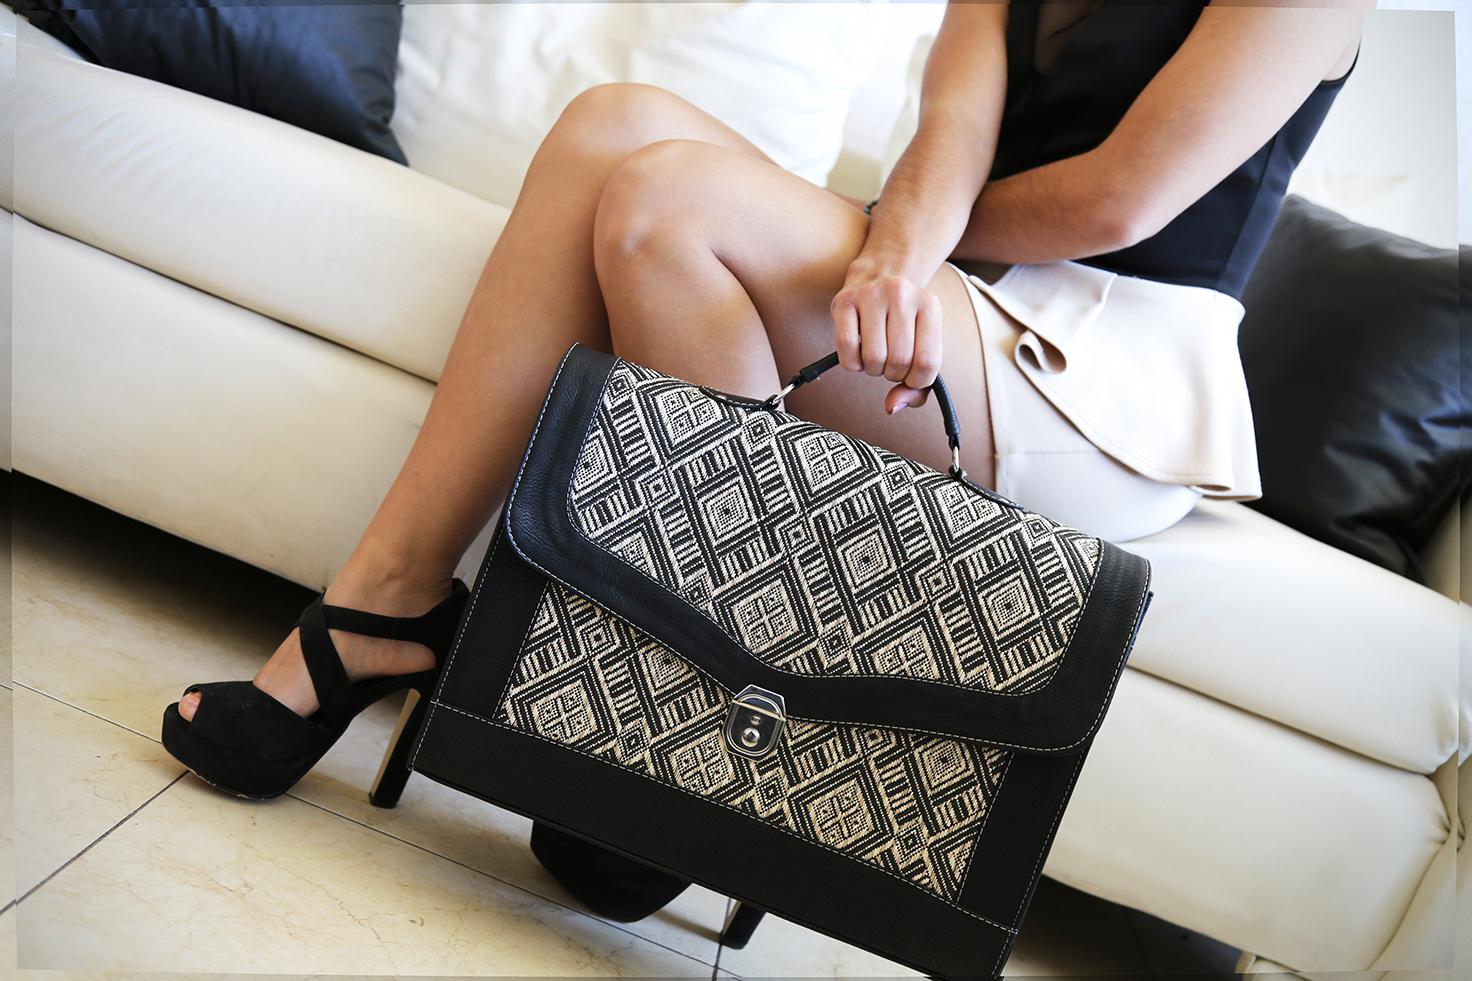 Maroge-Angela-Velazquez-fotografia-producto-diseño-5